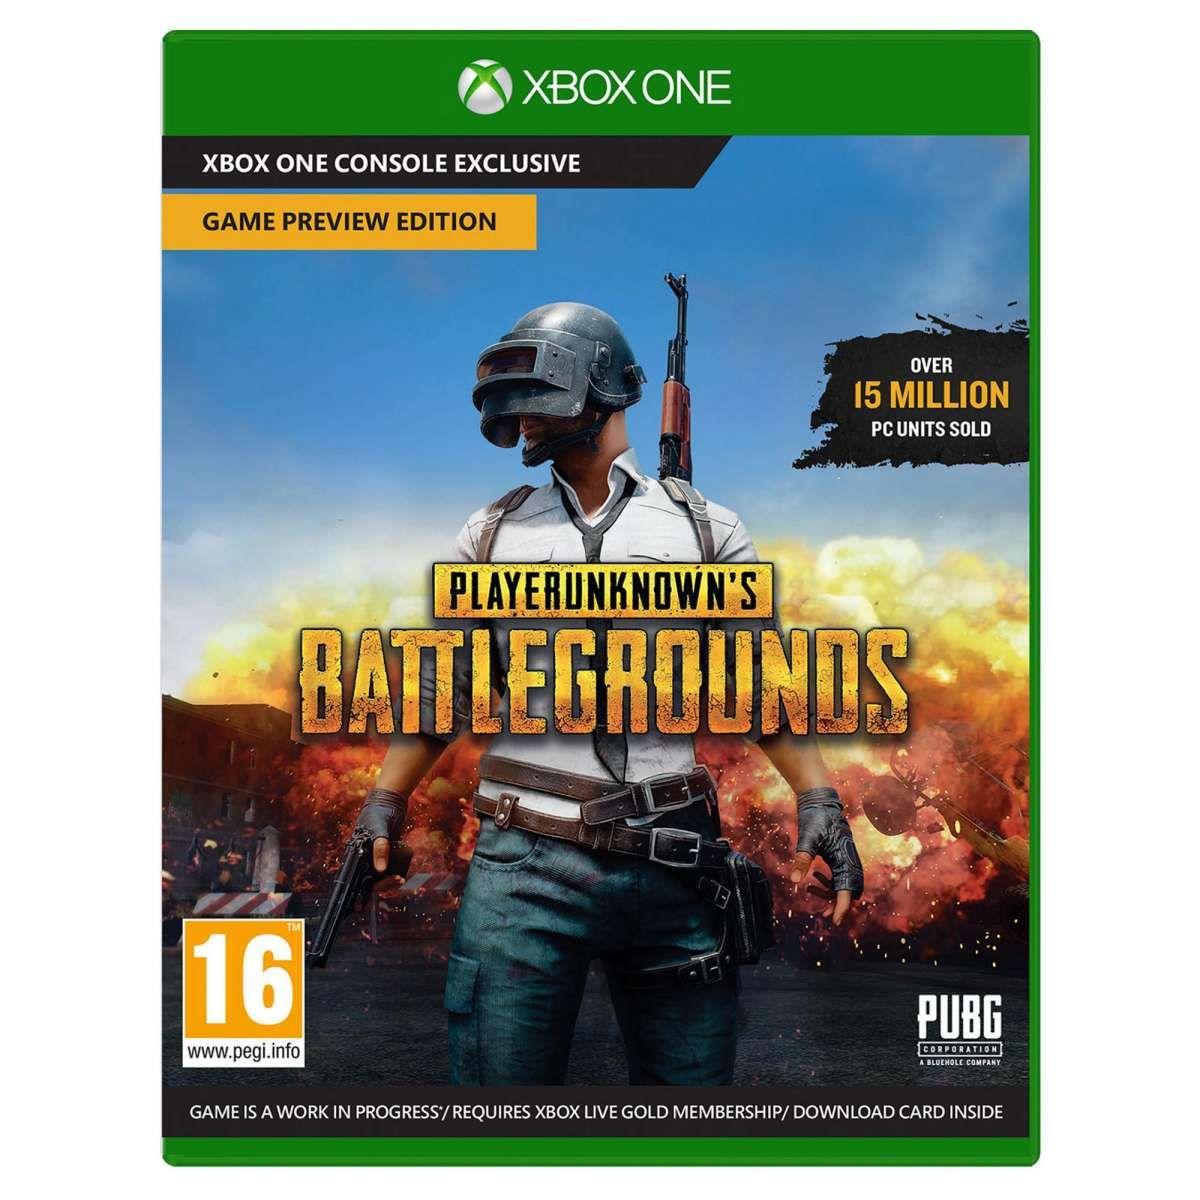 PLAYERUNKNOWN'S Battlegrounds (Pubg) Xbox One £9.99 / £12.98 Delivered @ Hughes